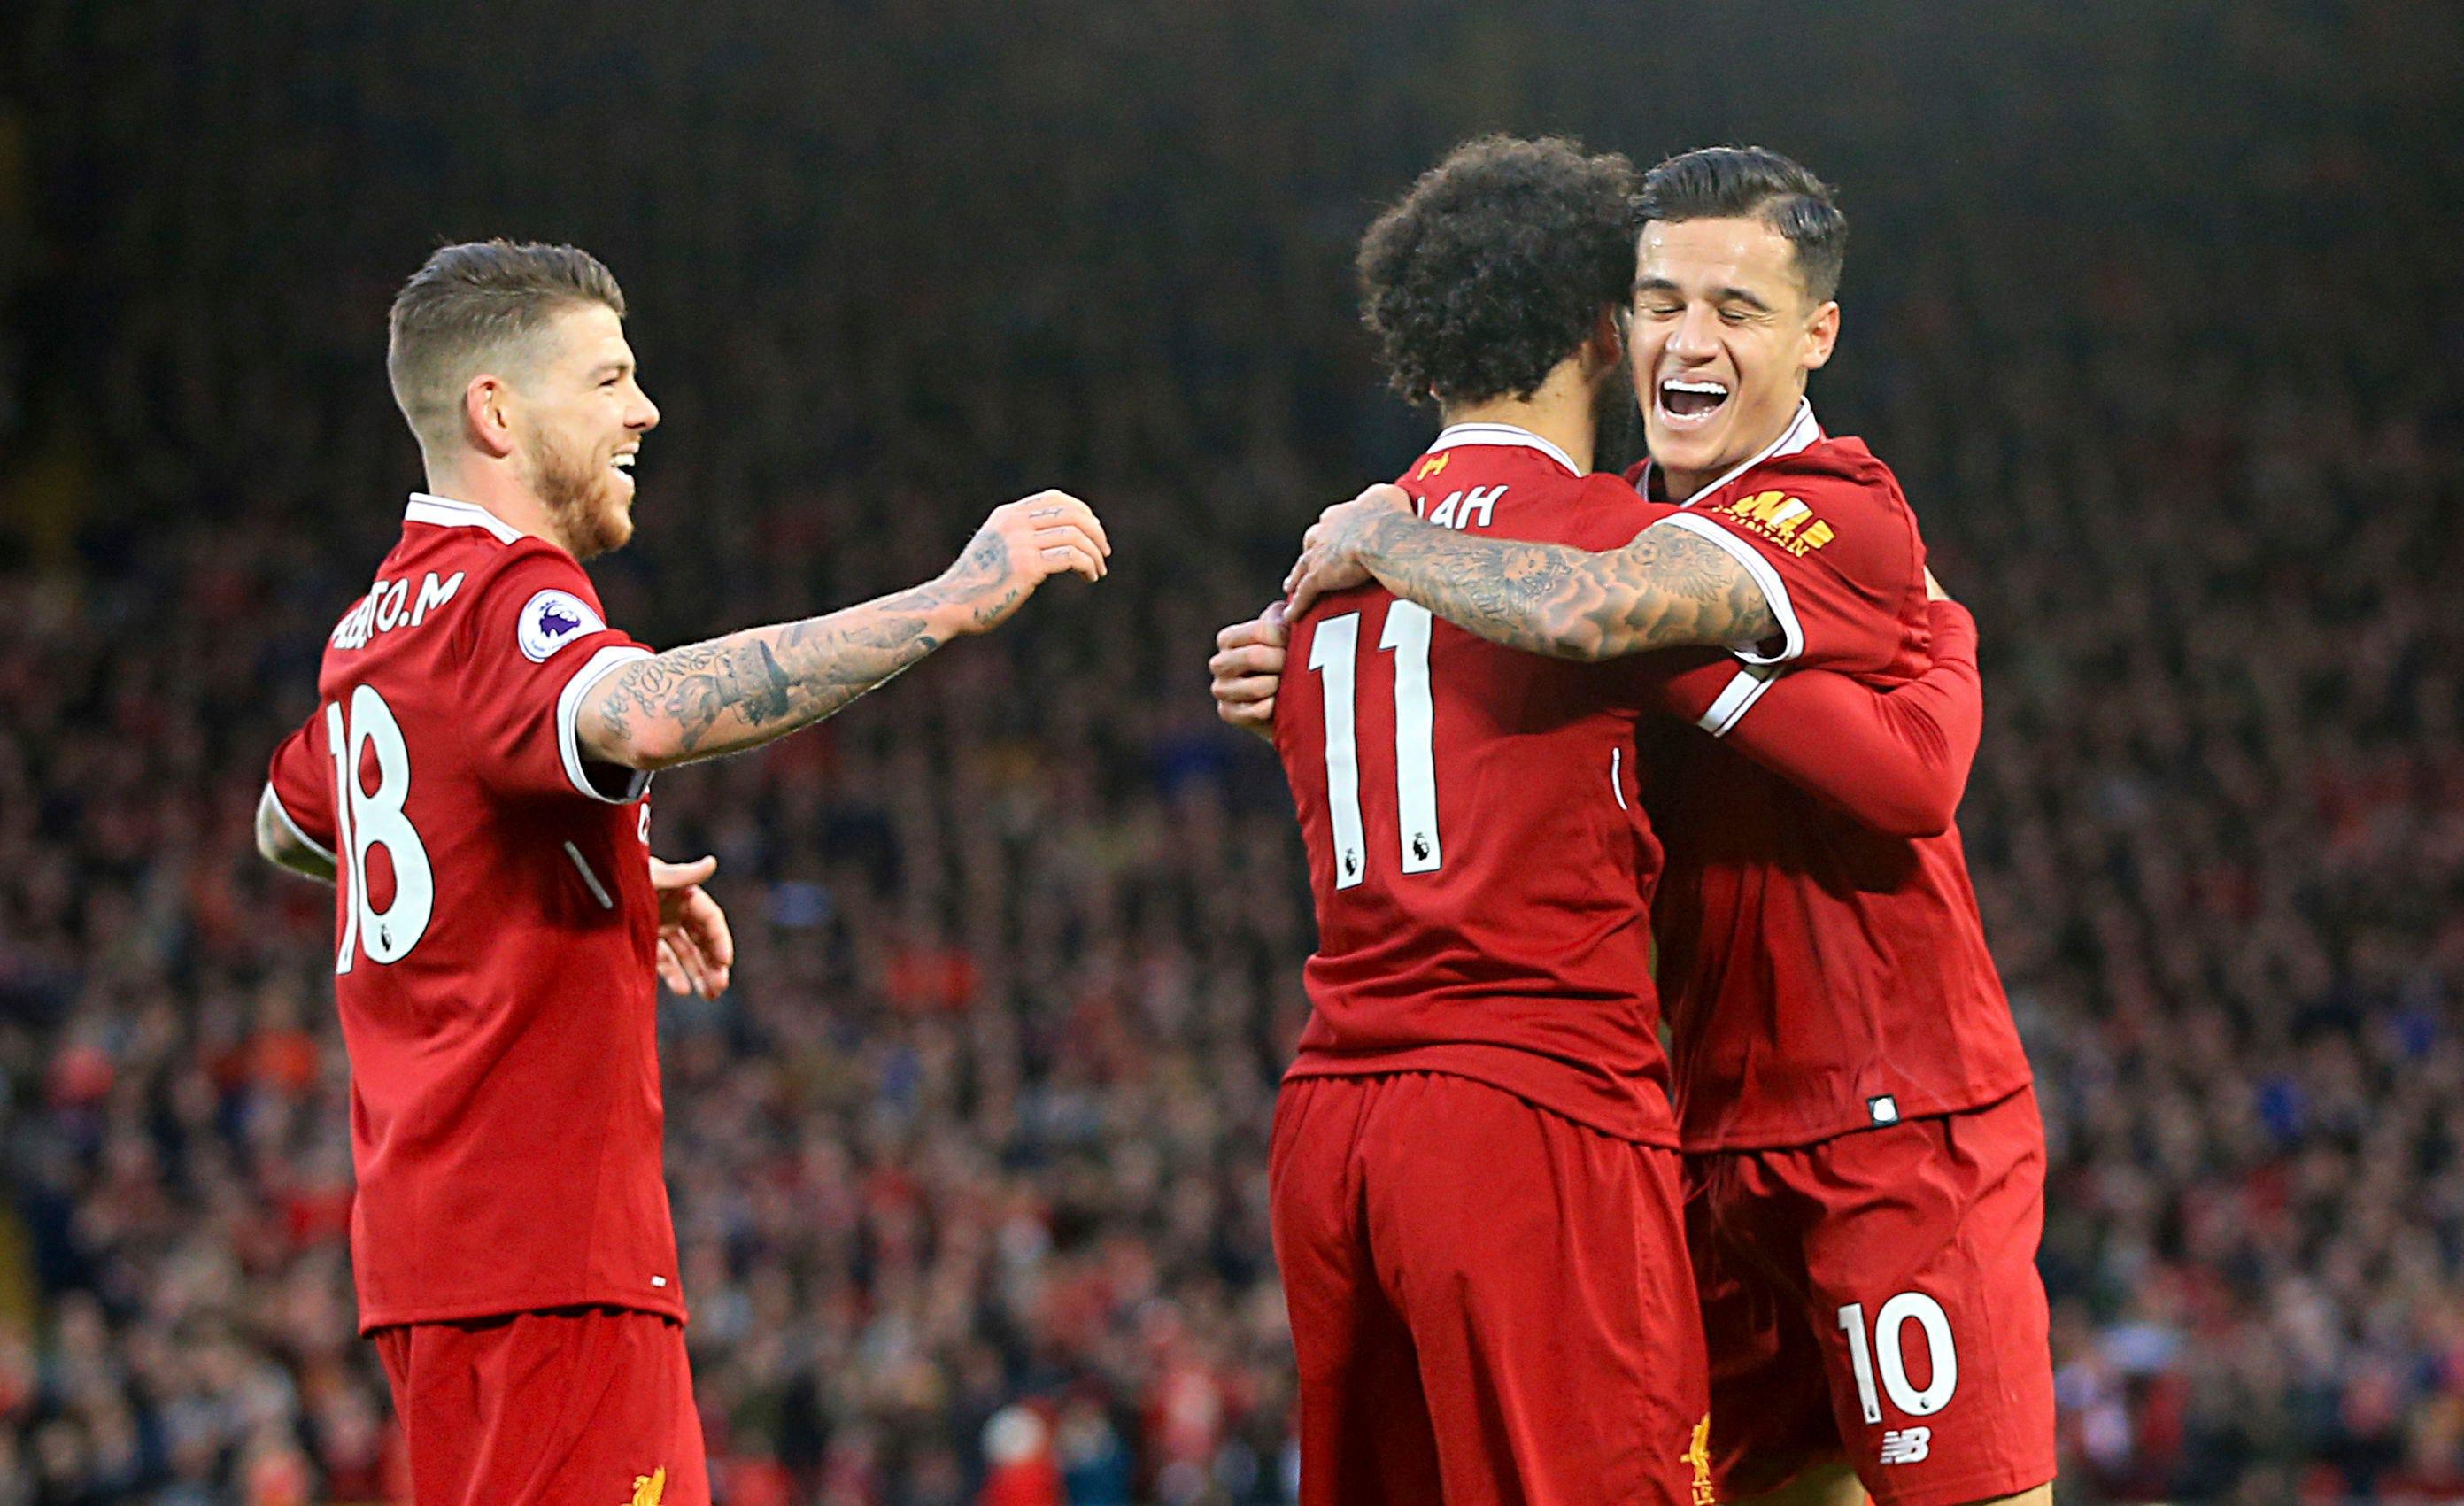 Sevilla coach: Be cautious vs Liverpool in Champions League